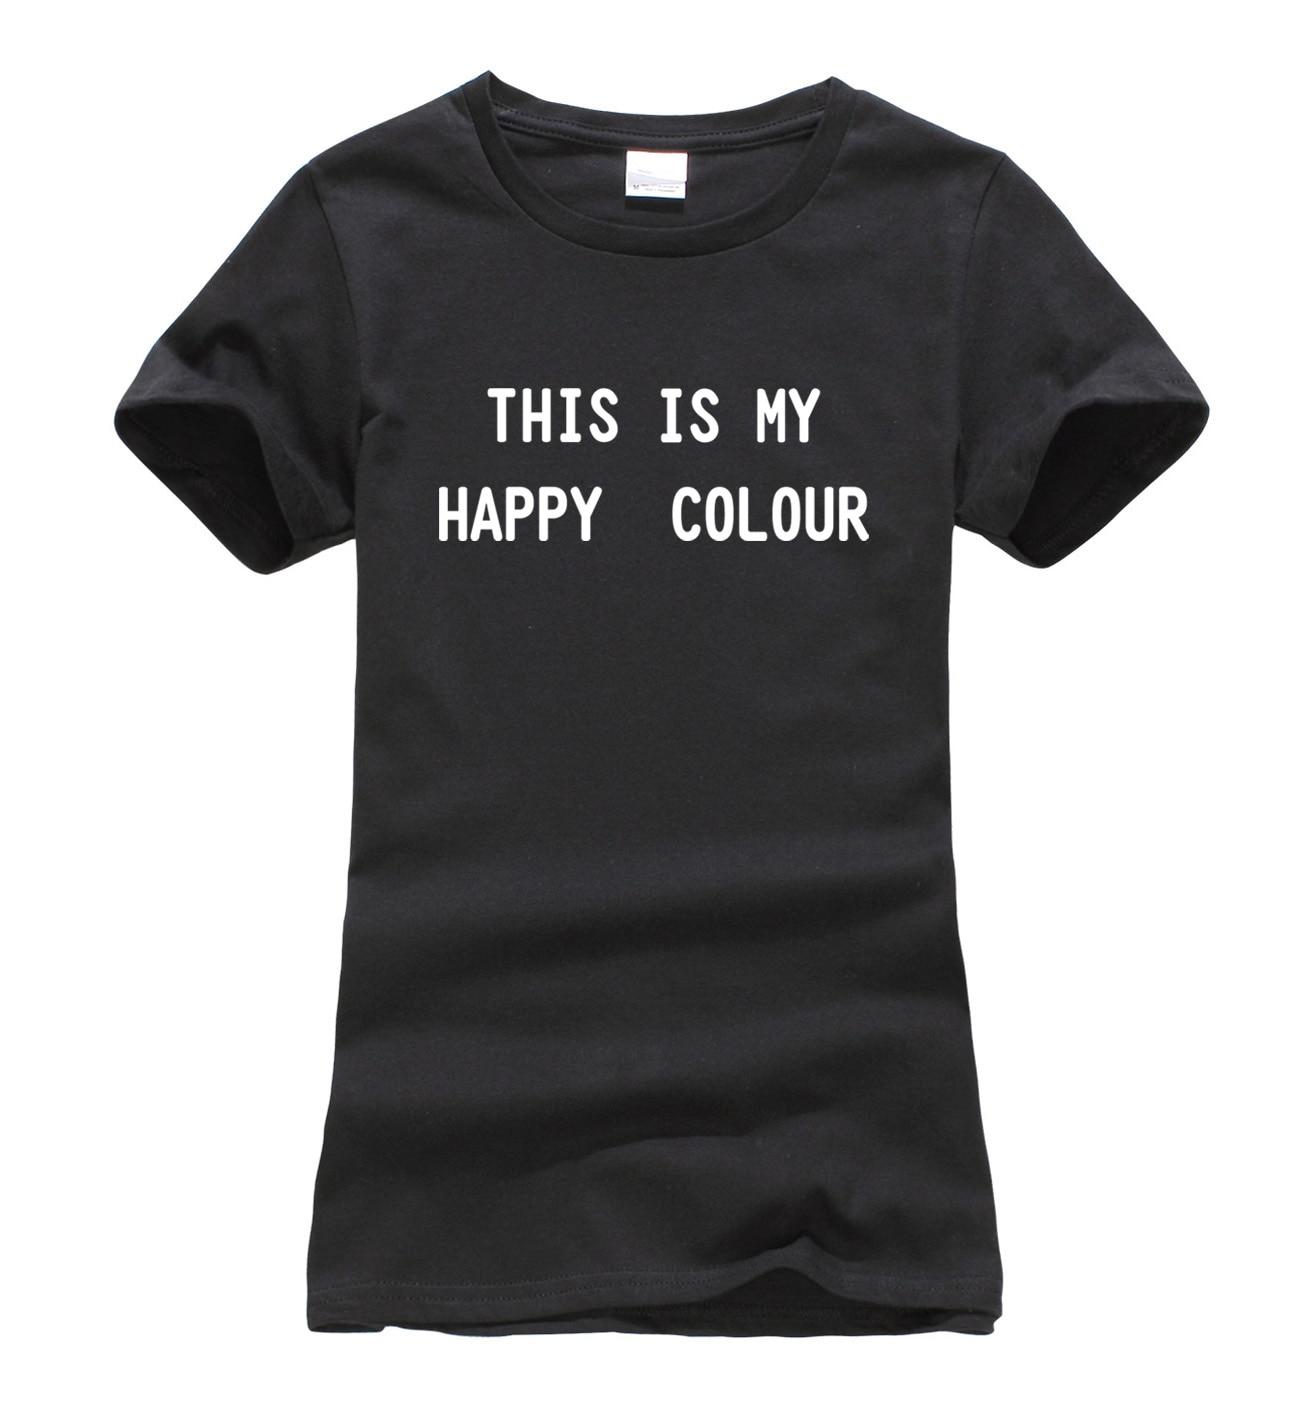 2018 Black This Is My Happy Color Print Women T-Shirt Fashion harajuku brand korean tee shirt femme summer funny punk cute tops